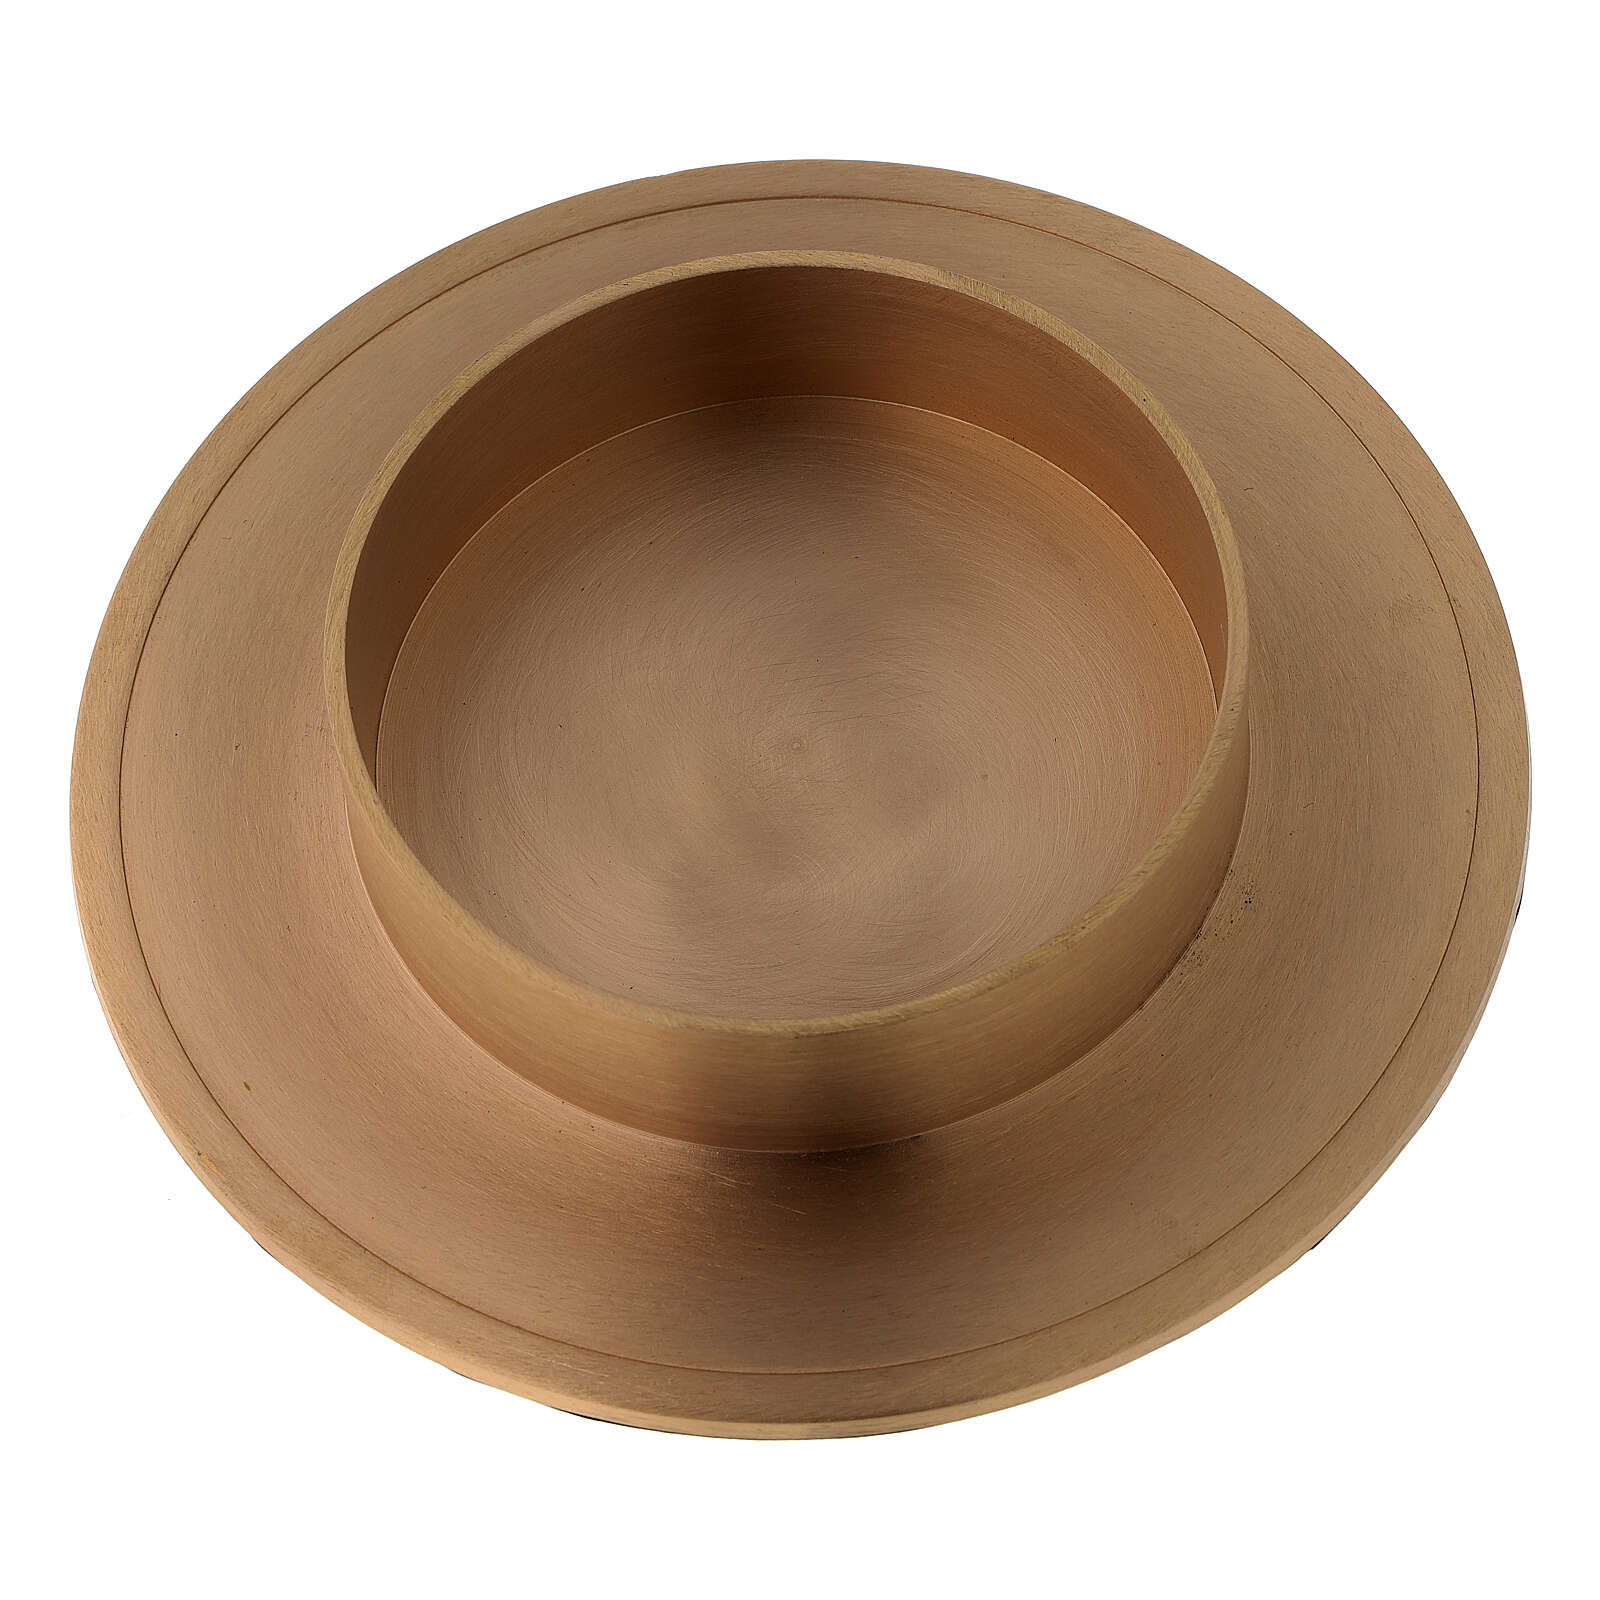 Brushed golden brass candle holder candle diameter 10 cm 4